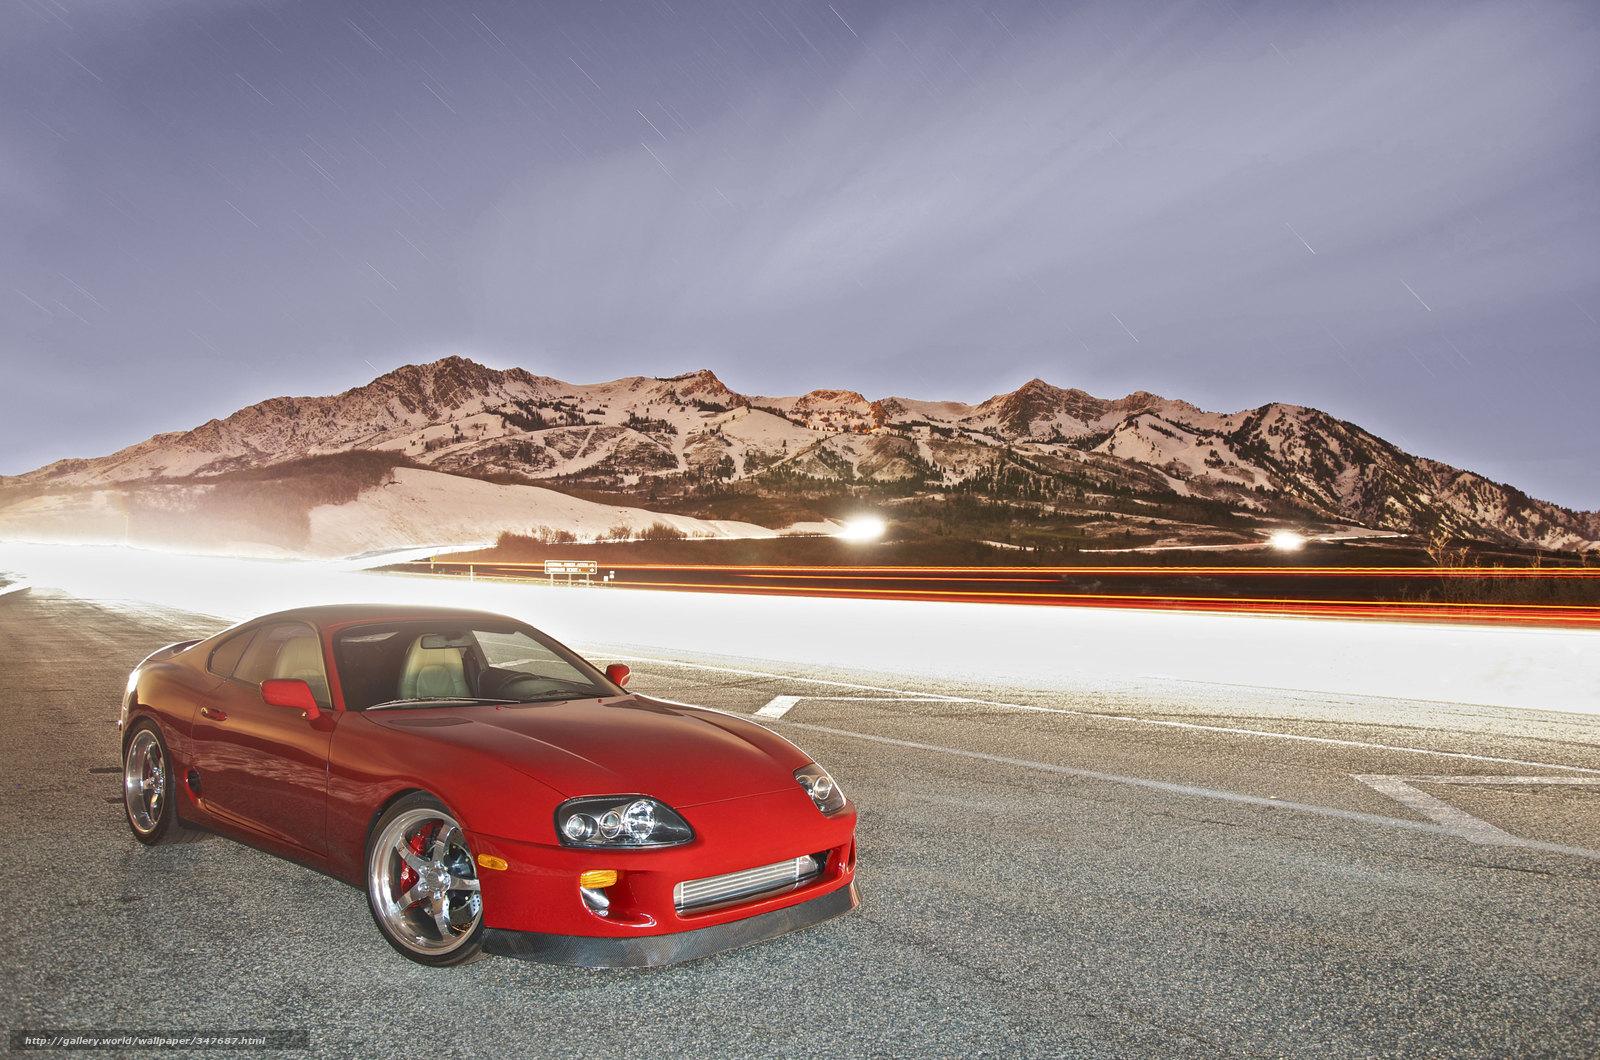 Download wallpaper Toyota,  supra,  toyota free desktop wallpaper in the resolution 4928x3264 — picture №347687